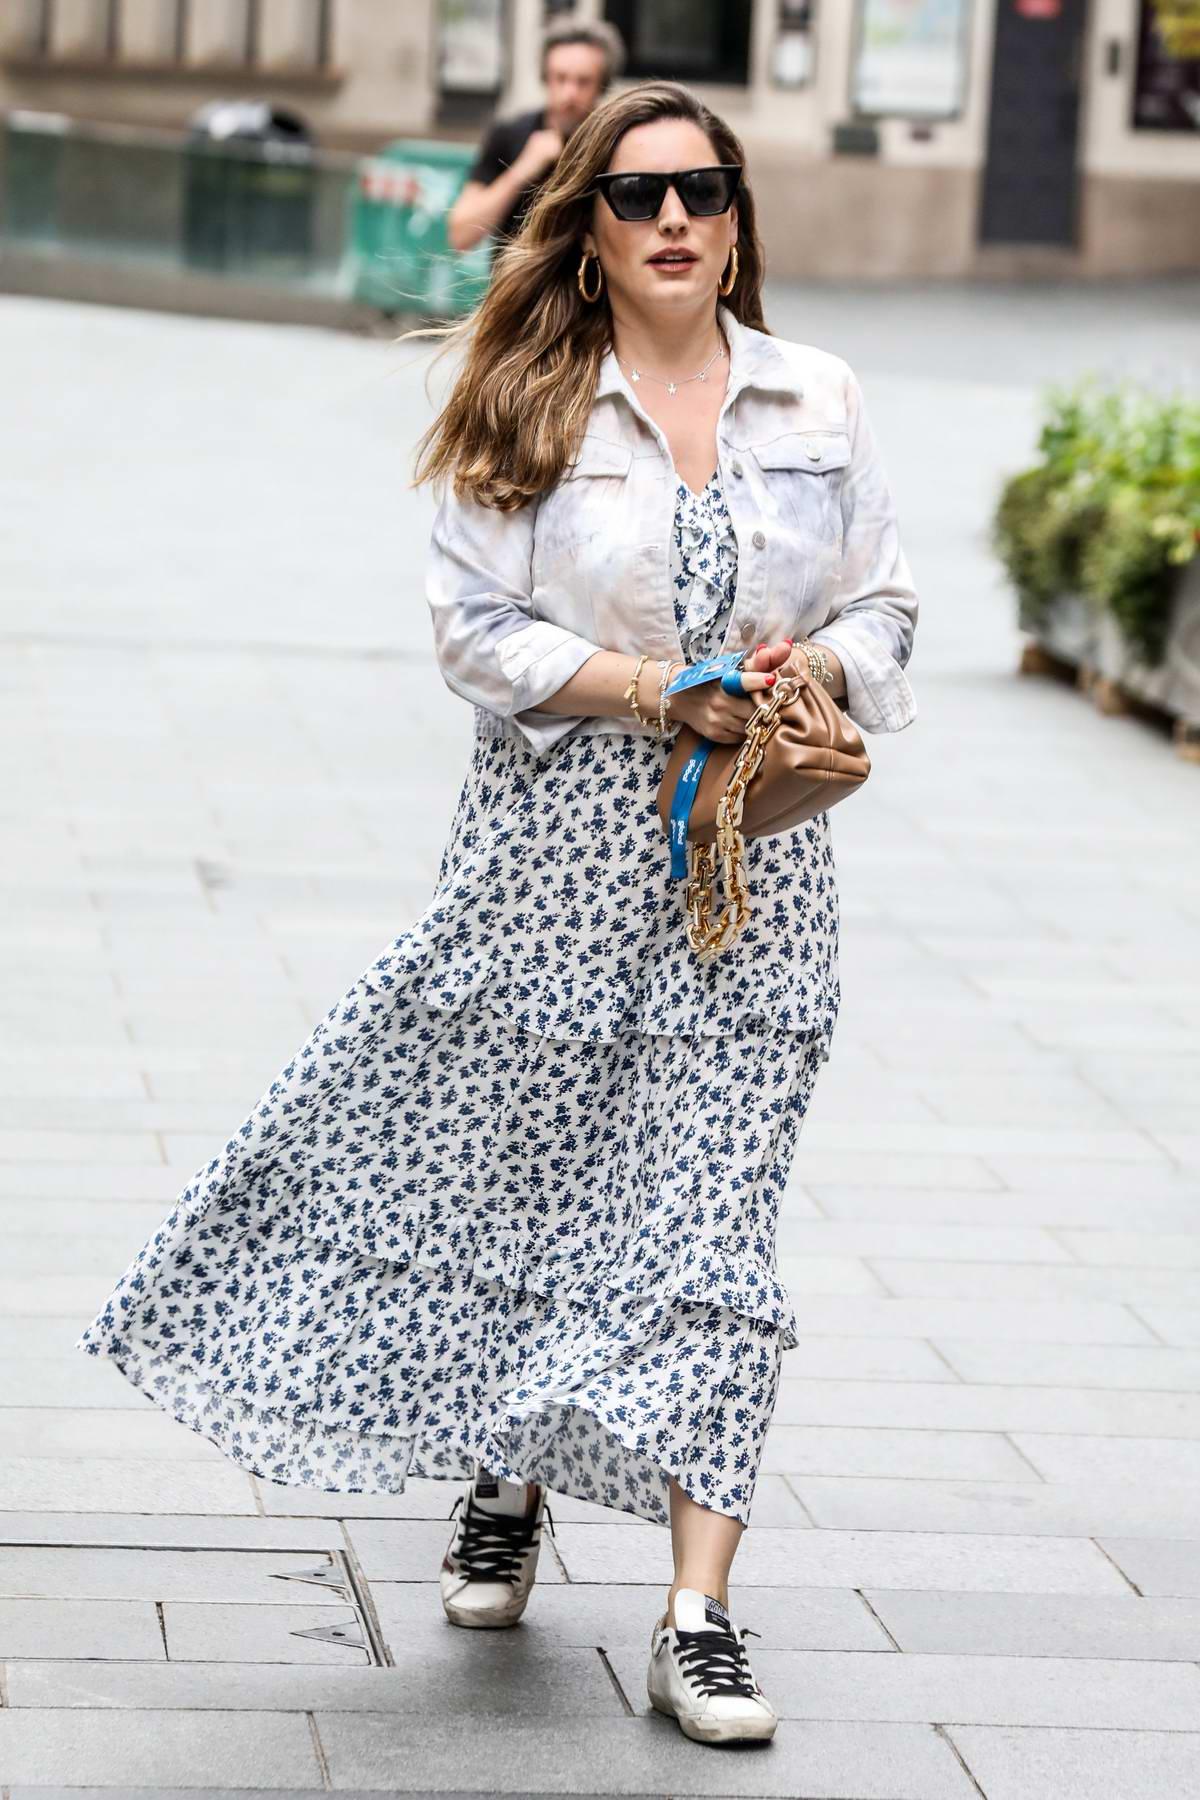 Kelly Brook seen wearing a summer dress as she leaves the Global Radio studios in London, UK